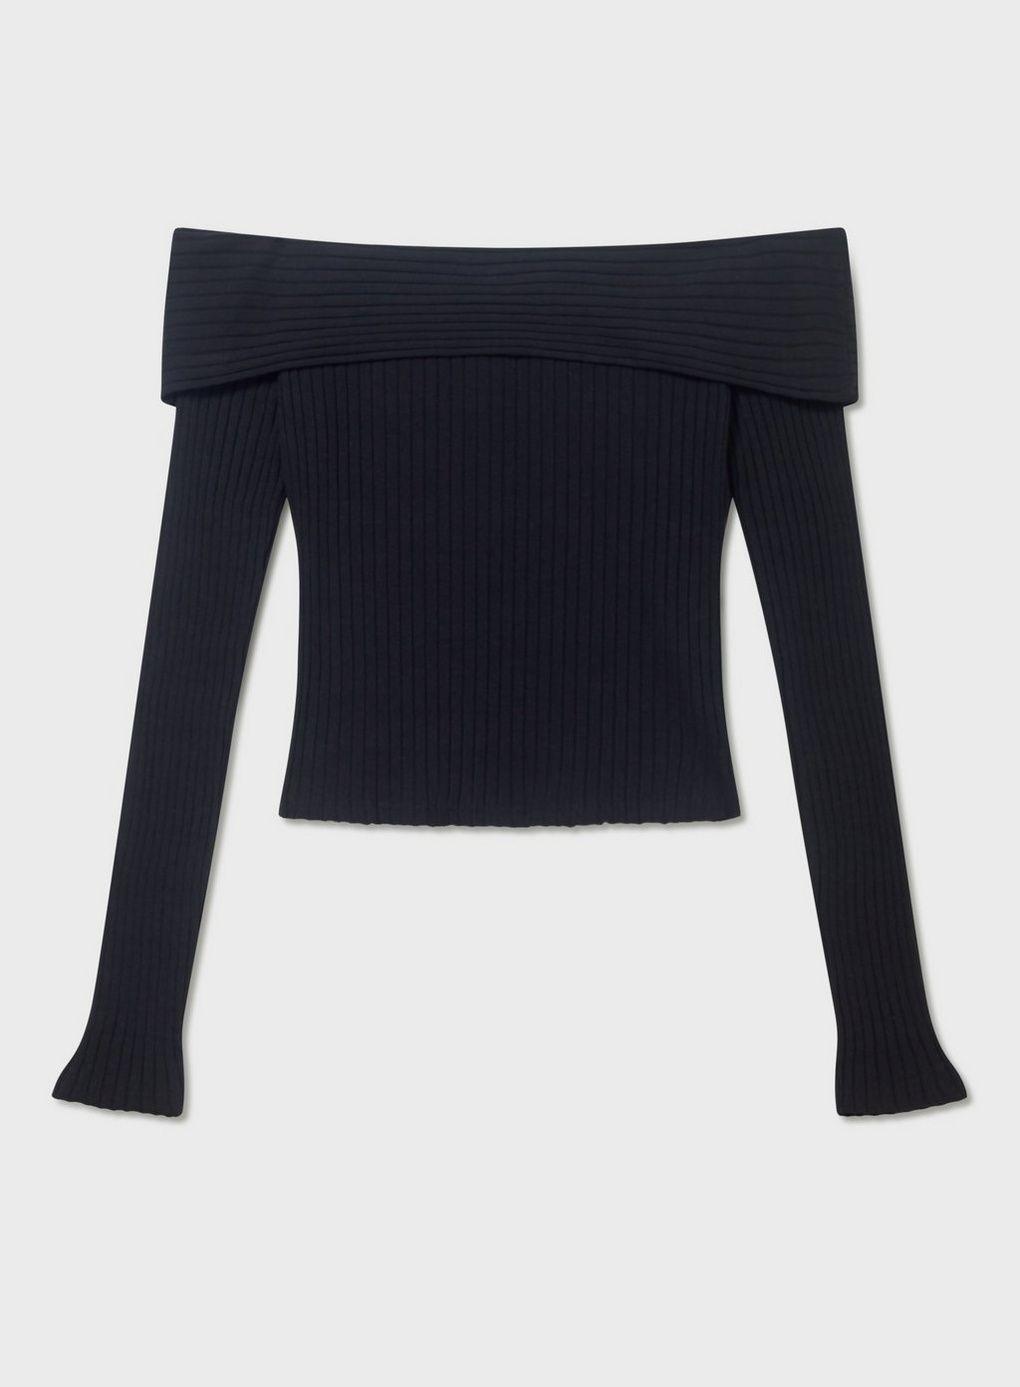 be59f7a2d55a6 Black Long Sleeve Jumbo Ribbed Bardot Top - Tops - Clothing - Miss Selfridge